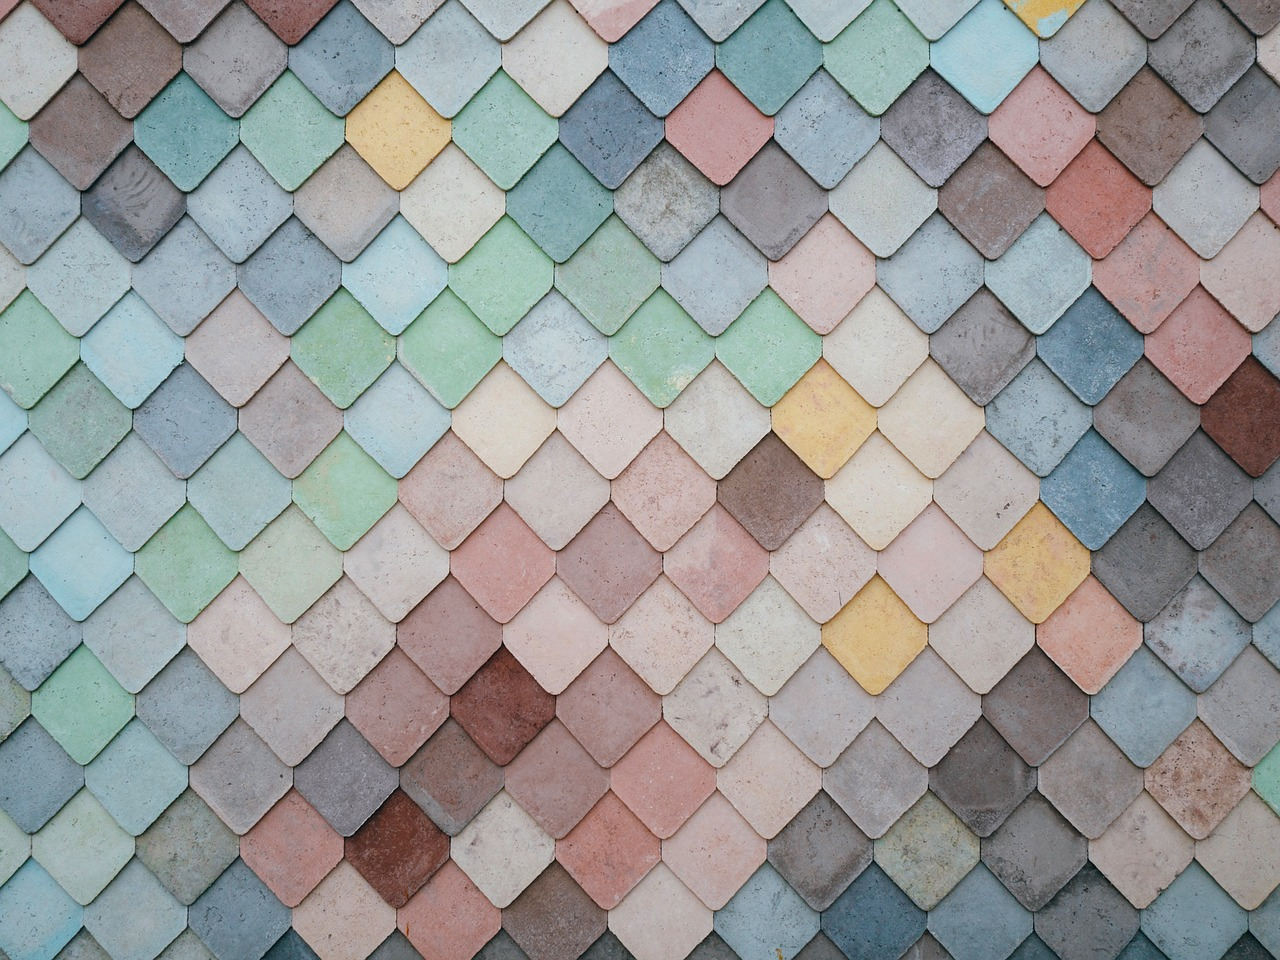 tiles-shapes-2617112_1280